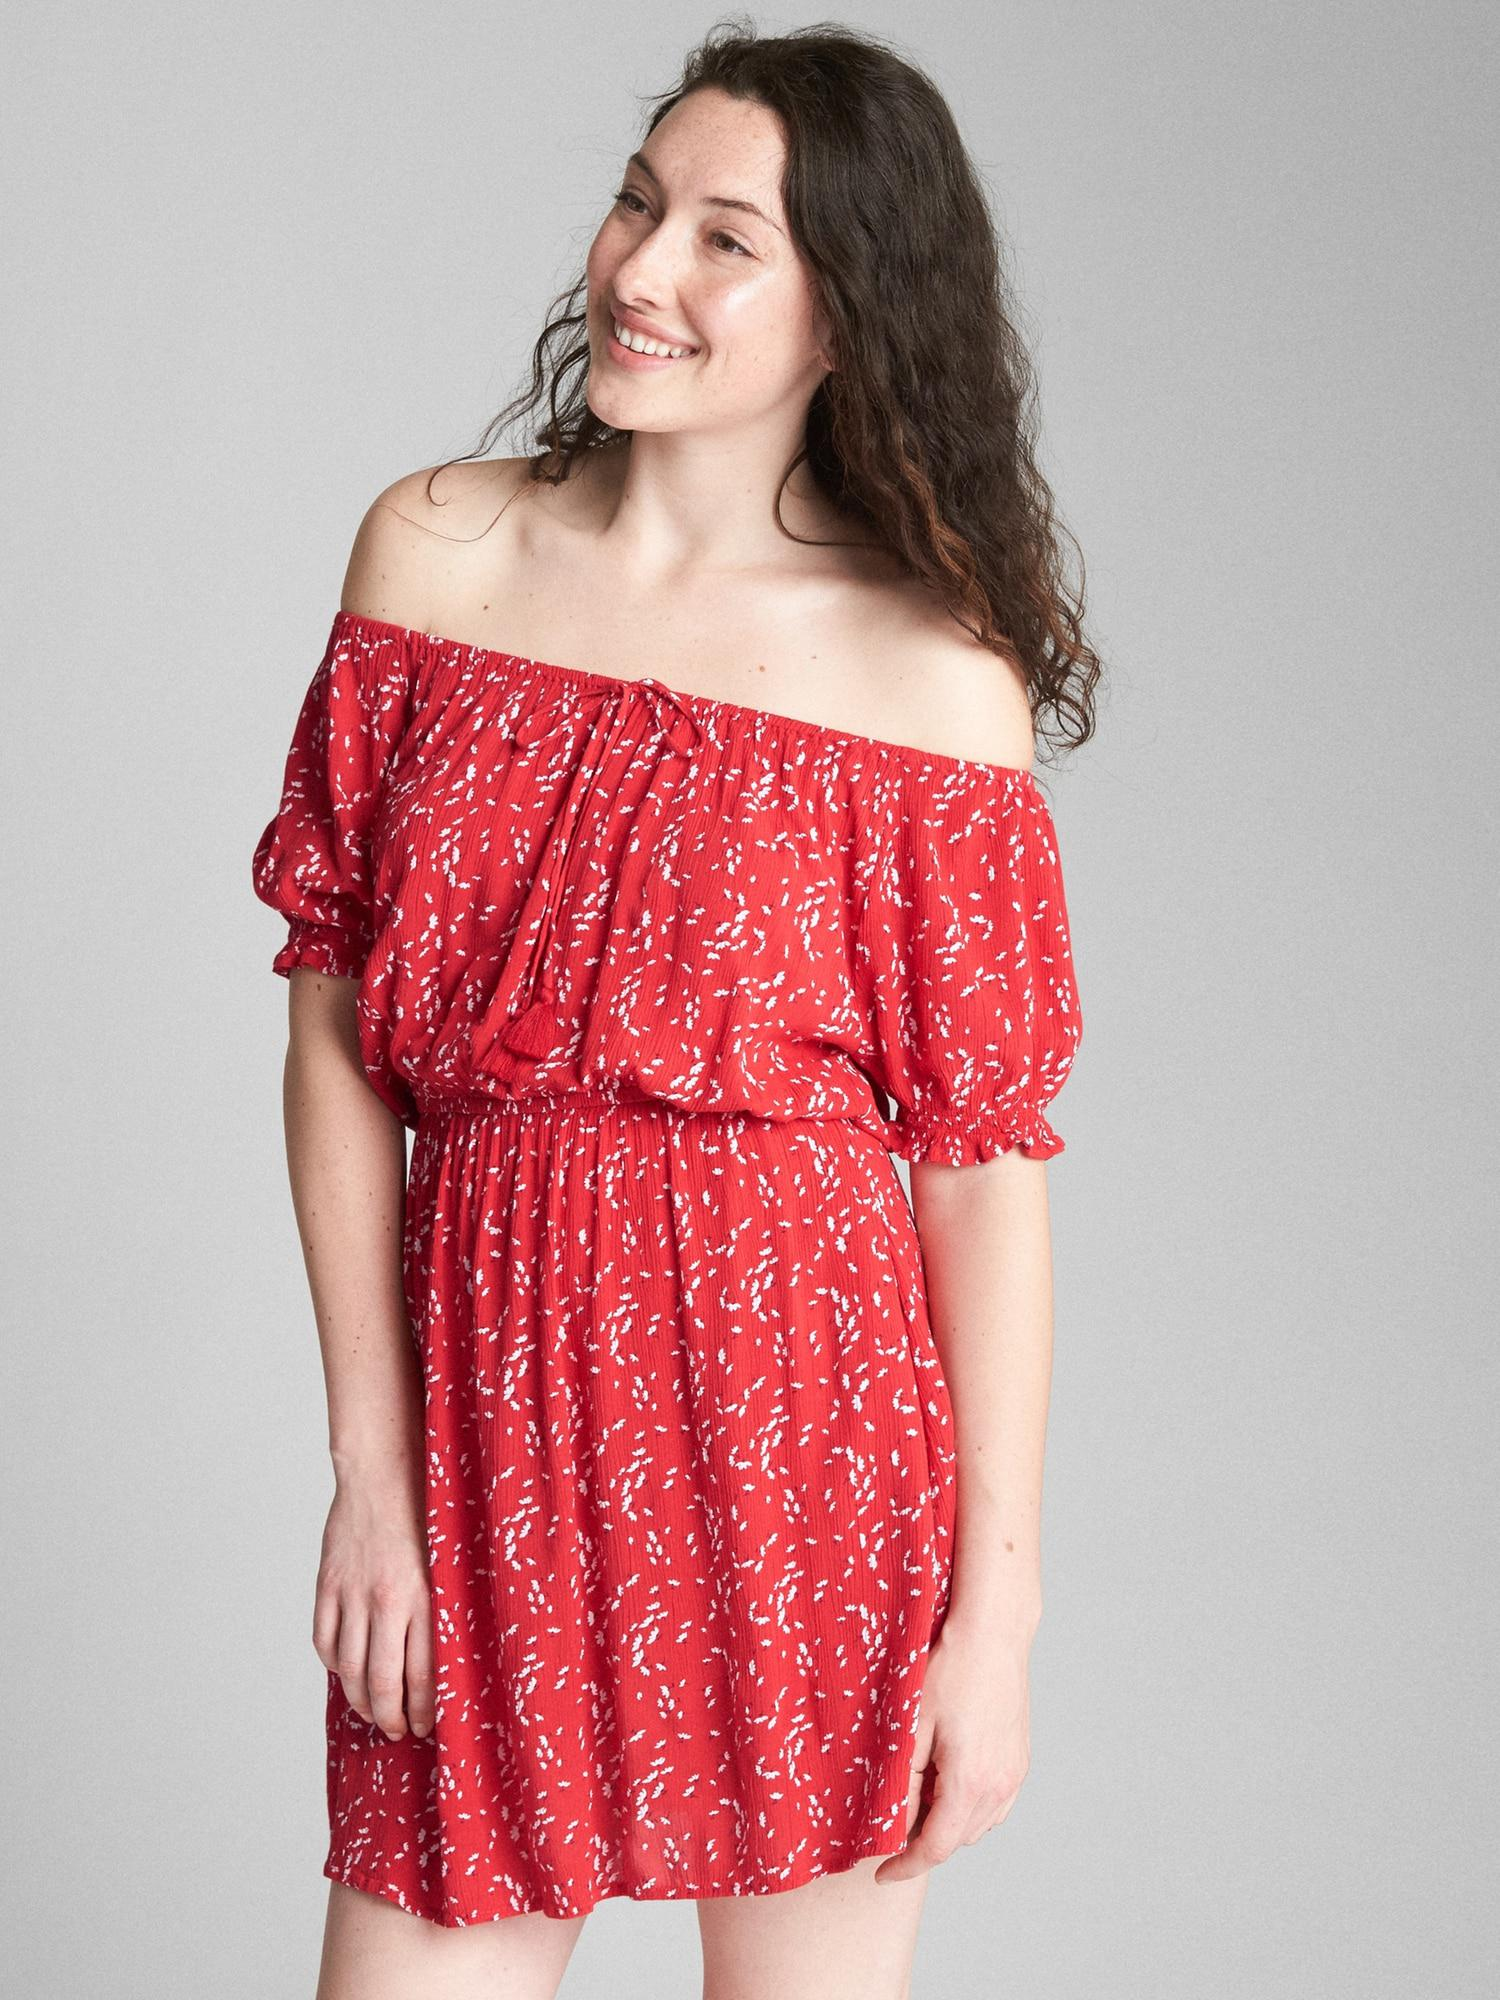 b0d6abfd8063 Lyst - Gap Off-shoulder Short Sleeve Floral Print Dress in Red